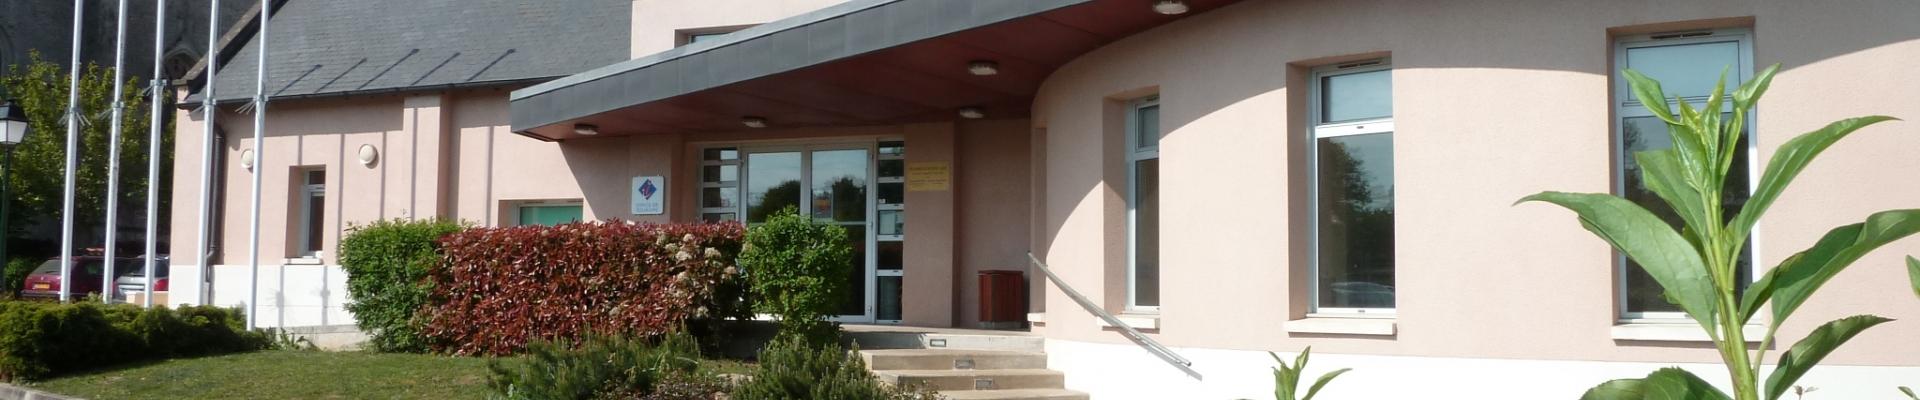 Façade de la médiathèque Municipale